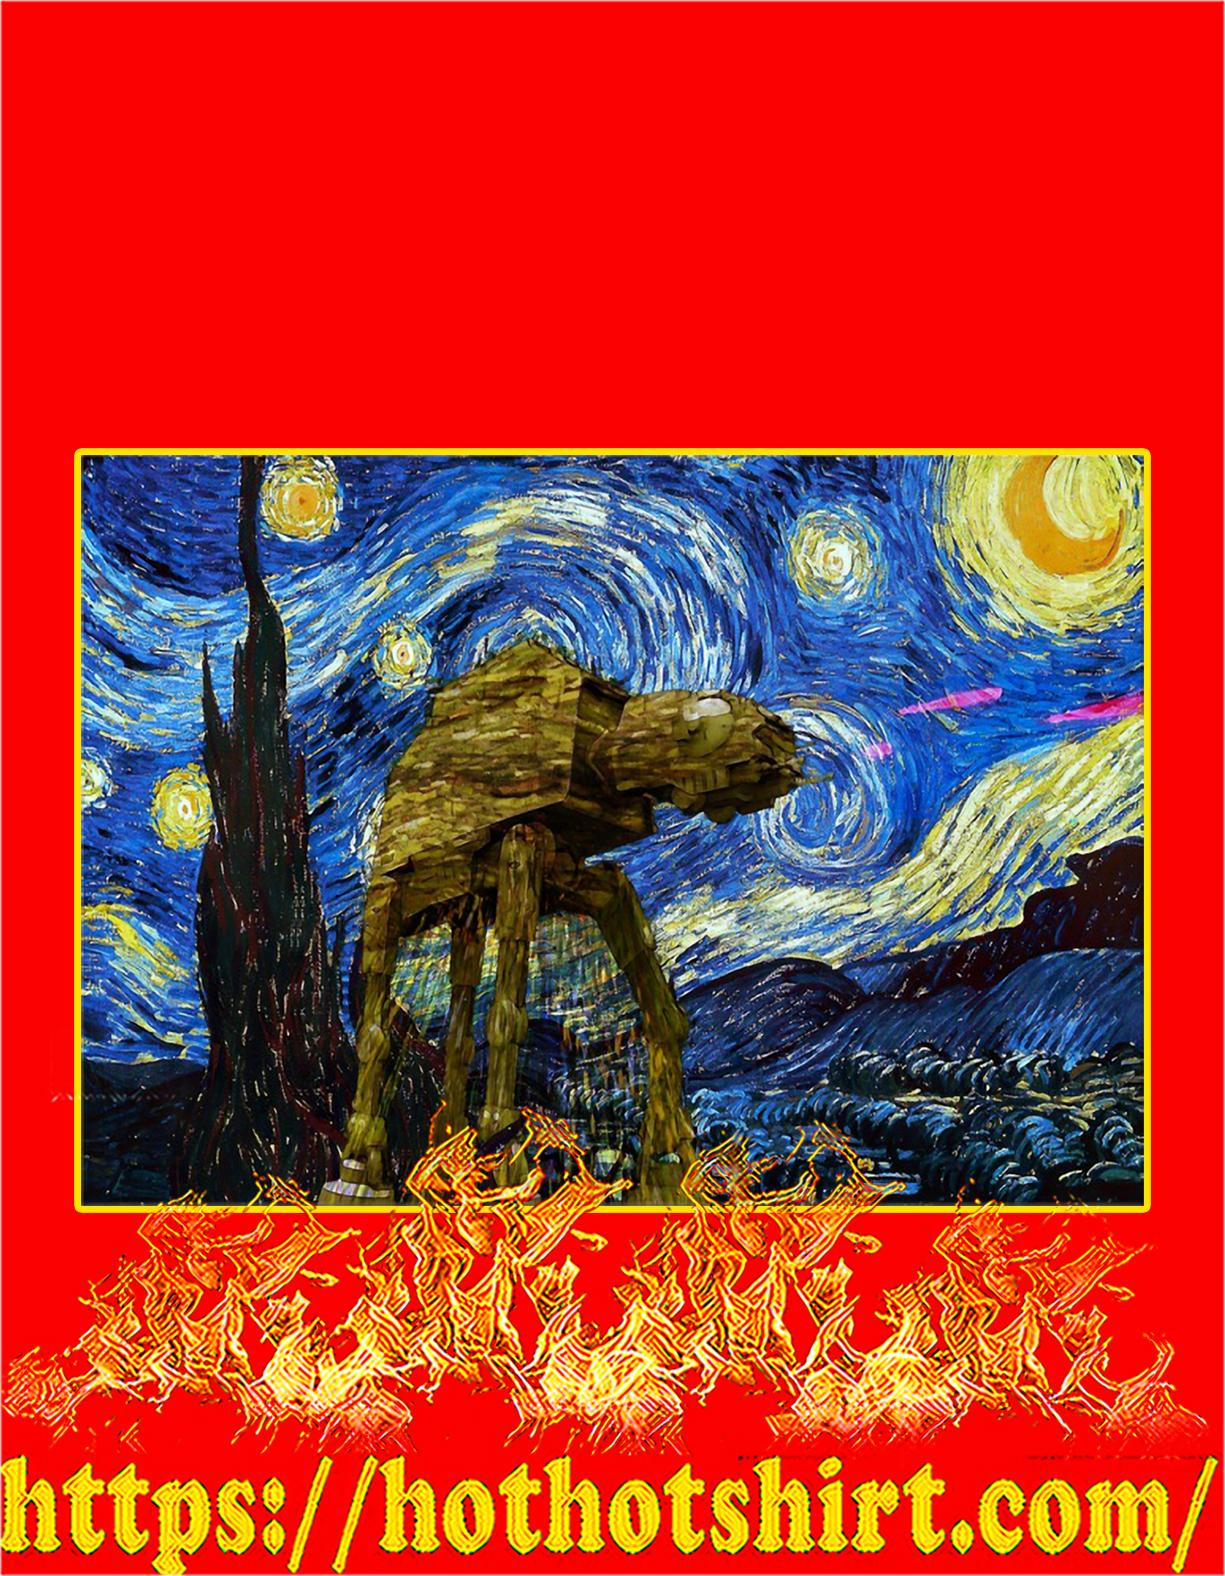 ATAT starry night van gogh poster - A4